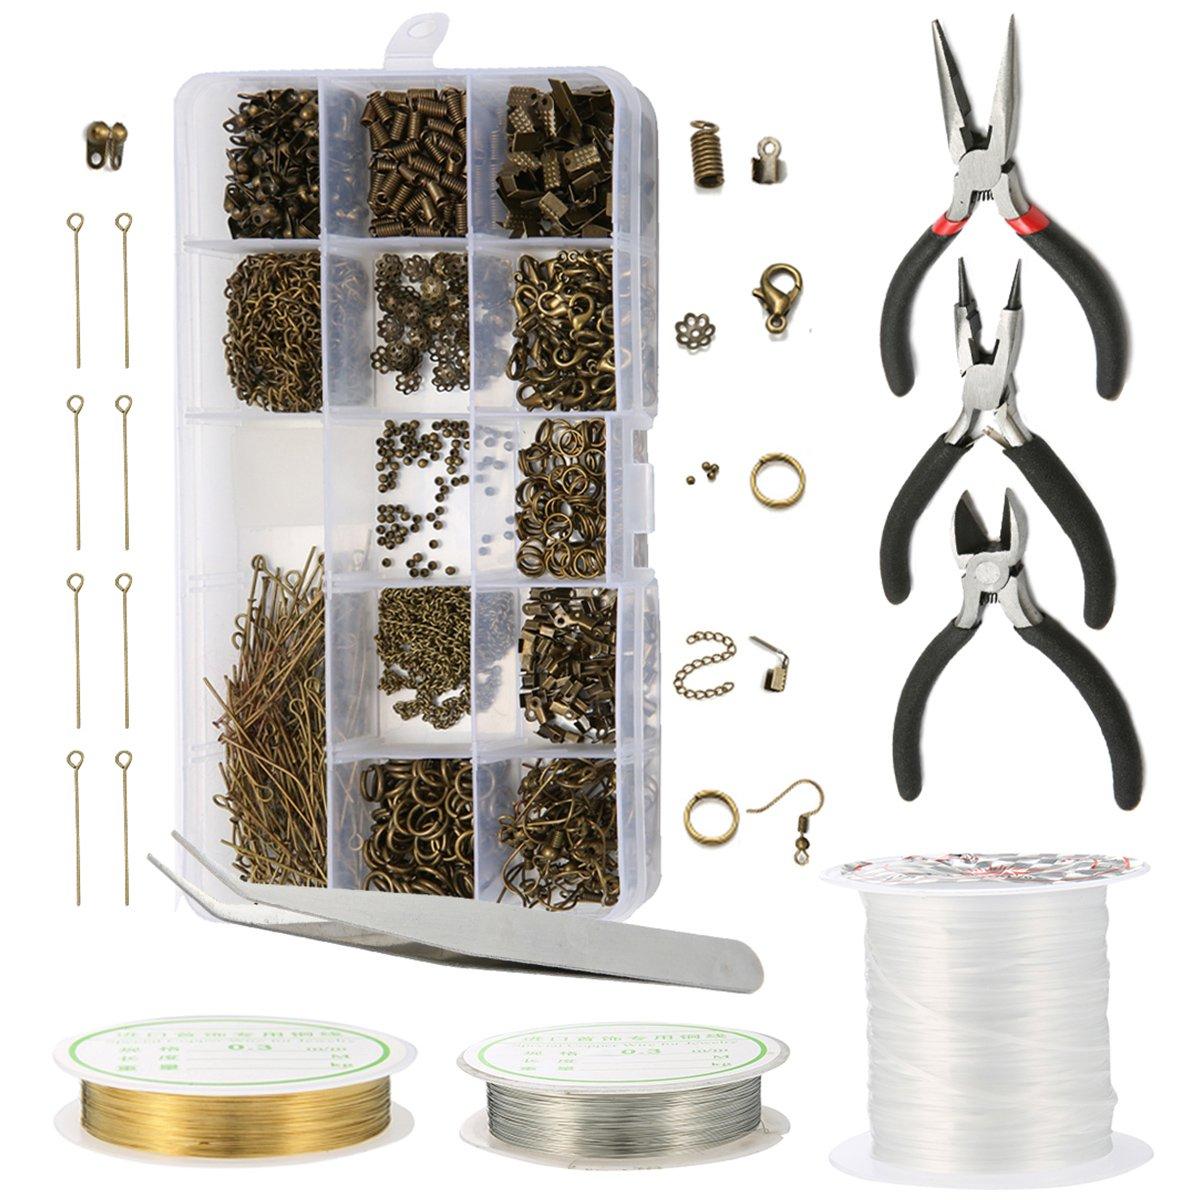 Jeteven 3000 Pcs Jewellery Making Accessories Kit Jewelry Findings Supplies Kit for DIY Handmade Jewellery Making Kit Jewellery Making Kit